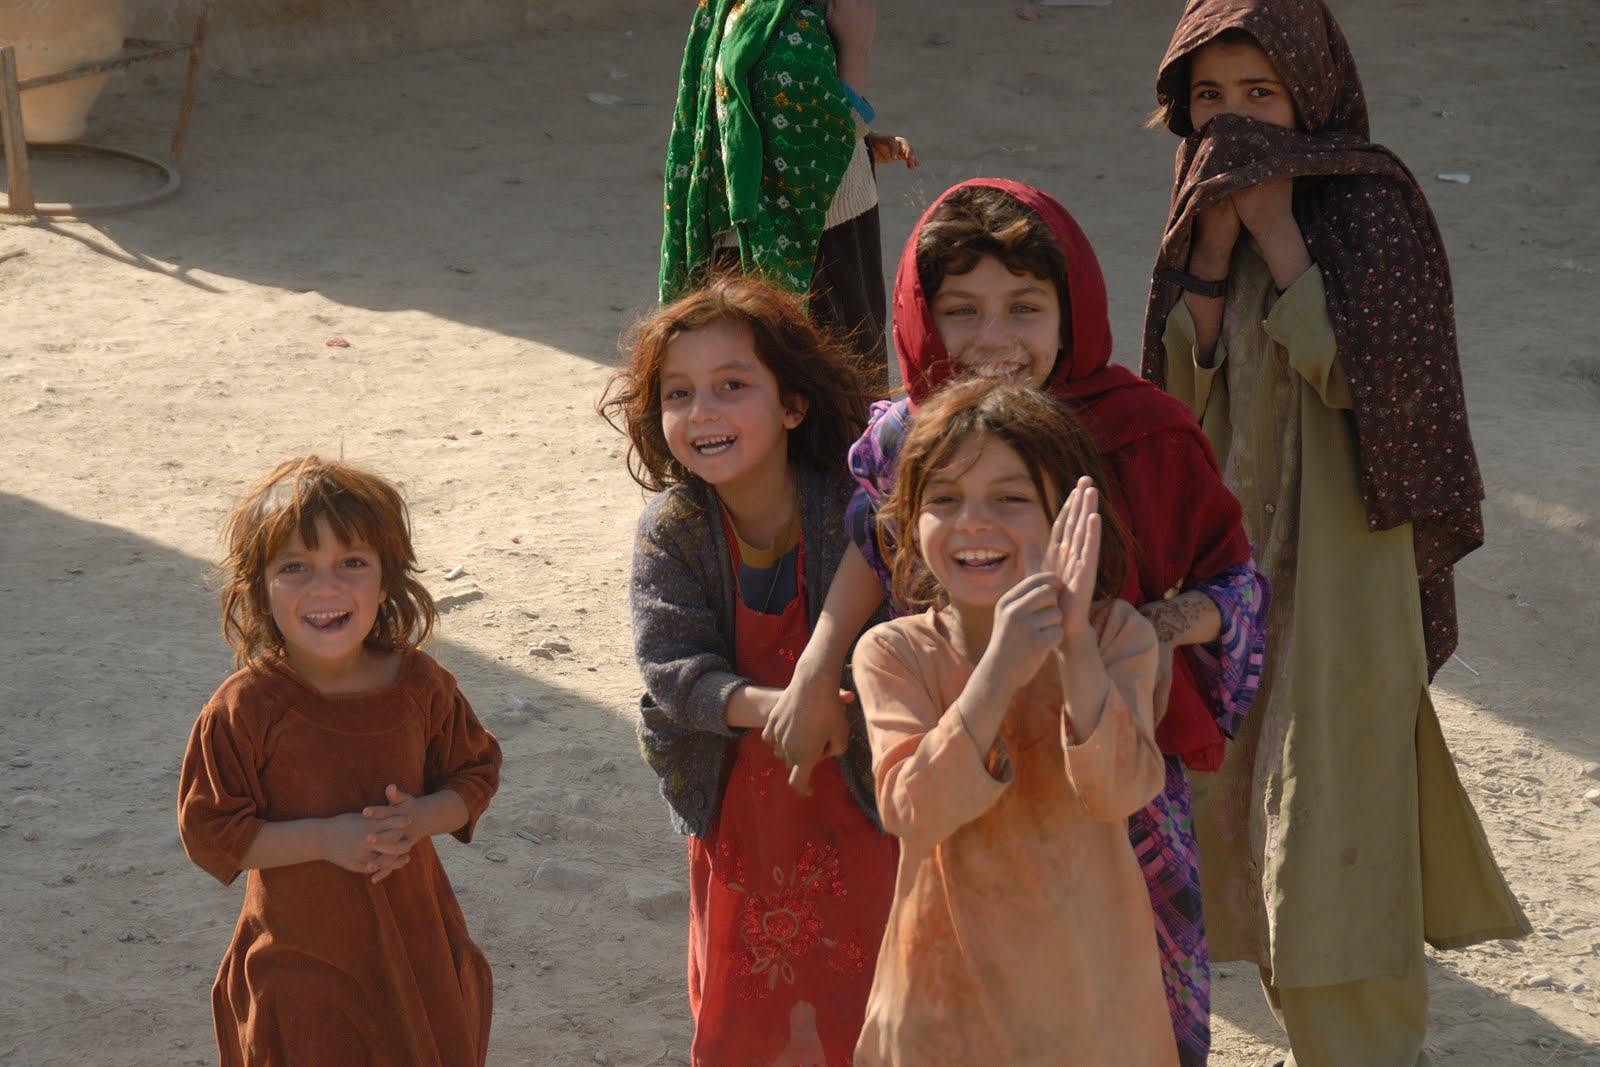 aroundtheworld97: Afghanistan: Years of war have left